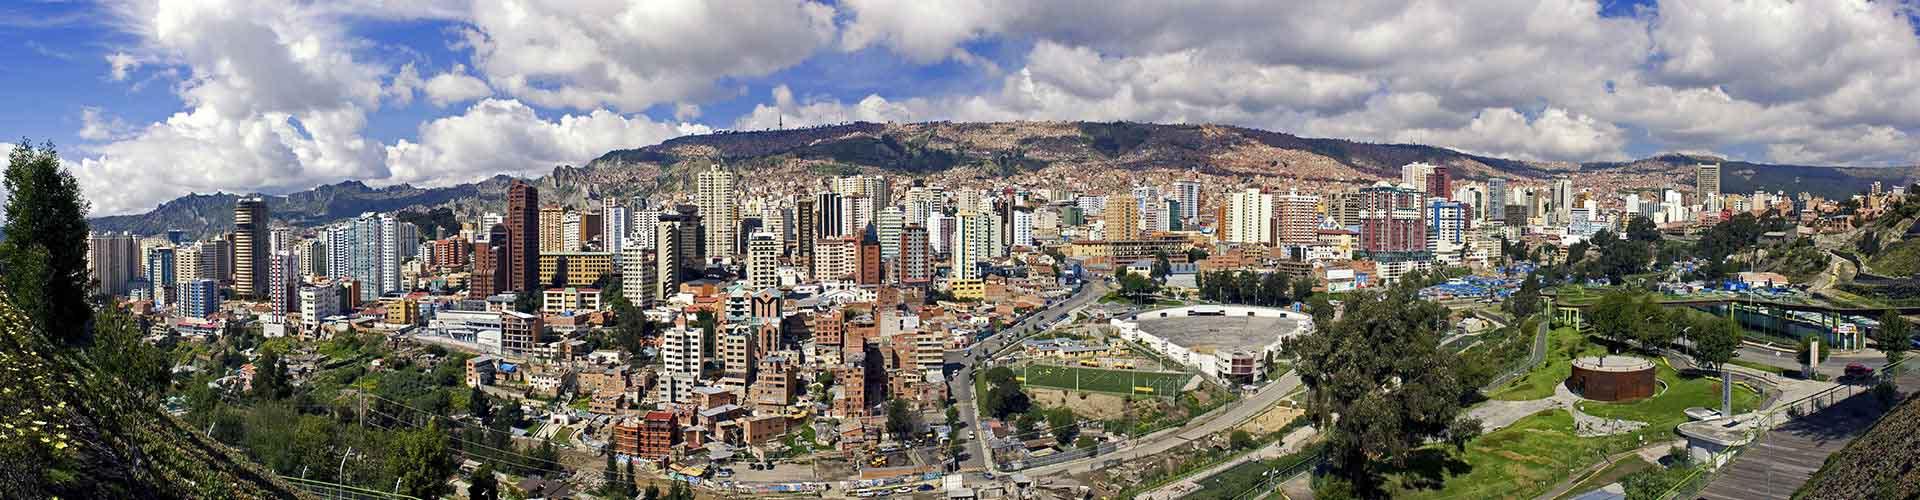 La Paz – Hostels em La Paz. Mapas para La Paz, Fotos e Avaliações para cada Hostels em La Paz.